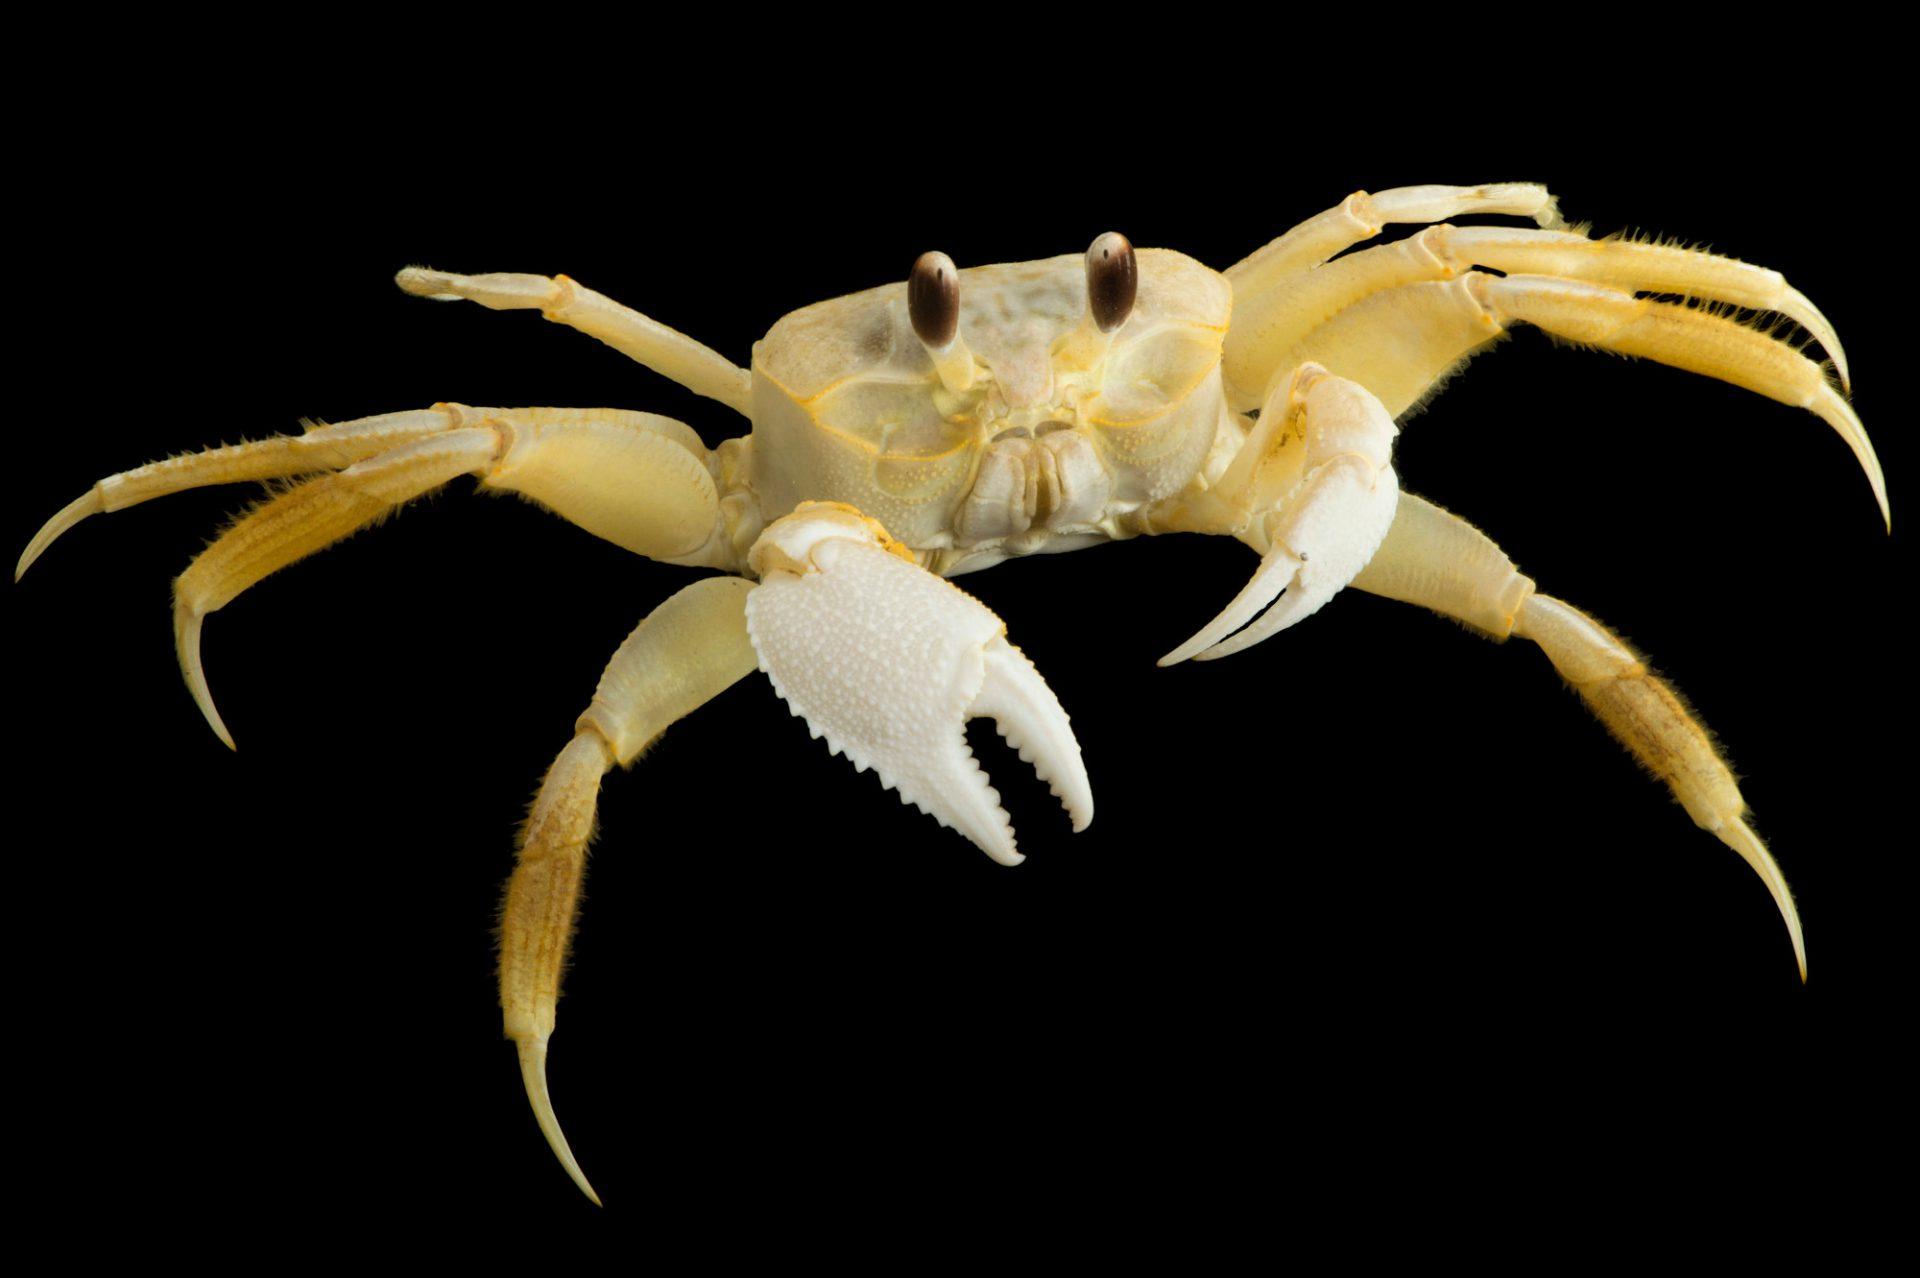 Photo: An Atlantic ghost crab (Ocypode quadrata) at Gulf Specimen Marine Lab.